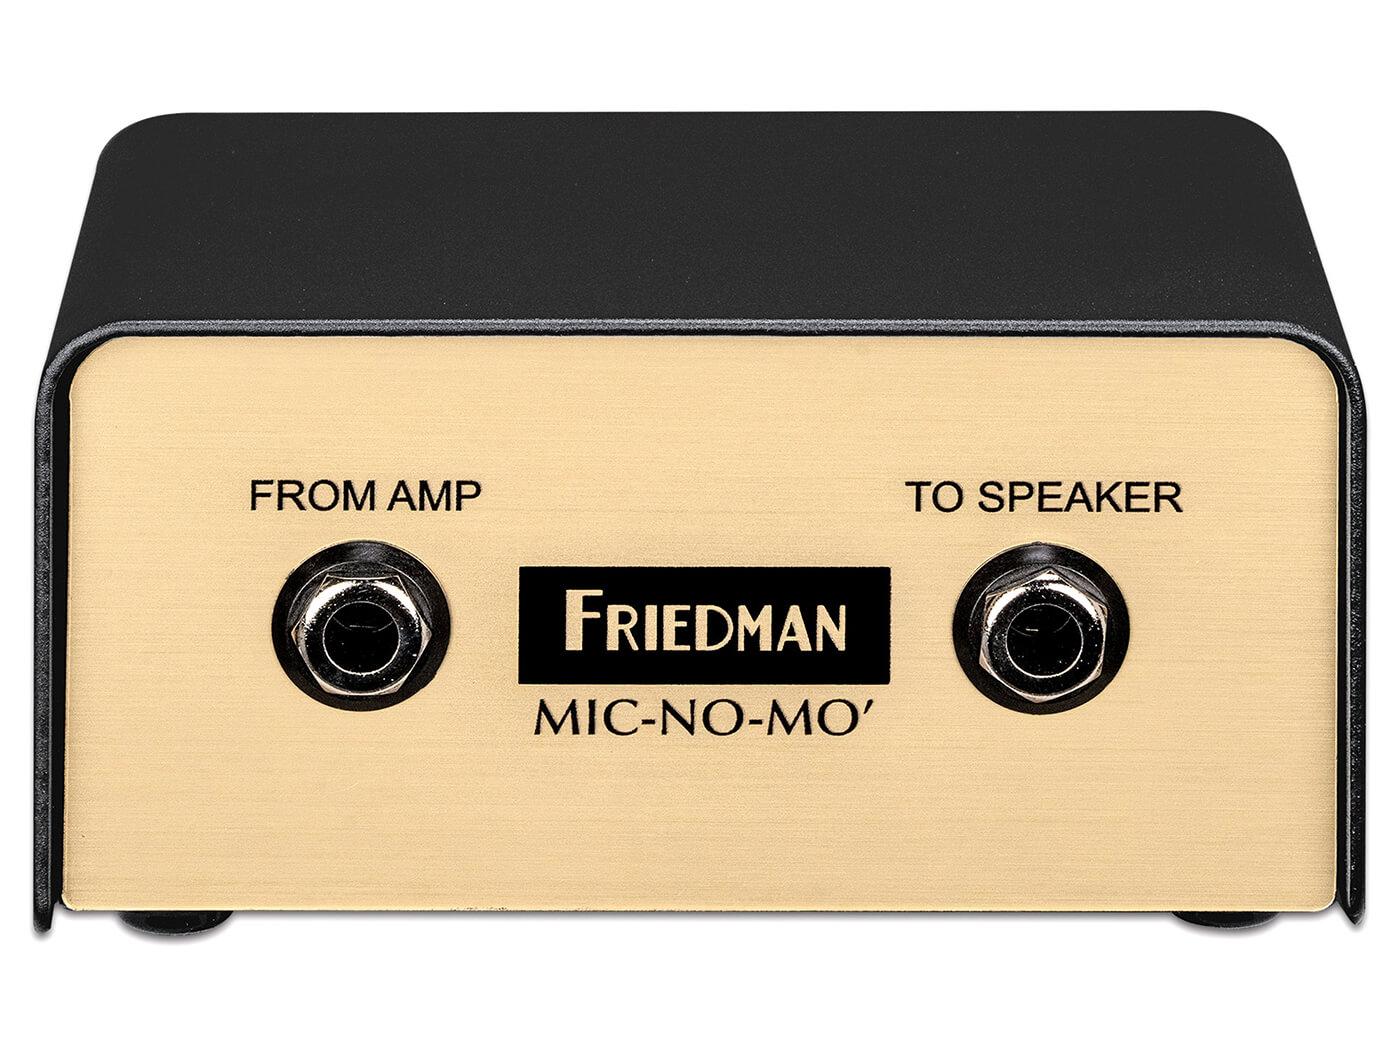 Friedman mic-no-mic front